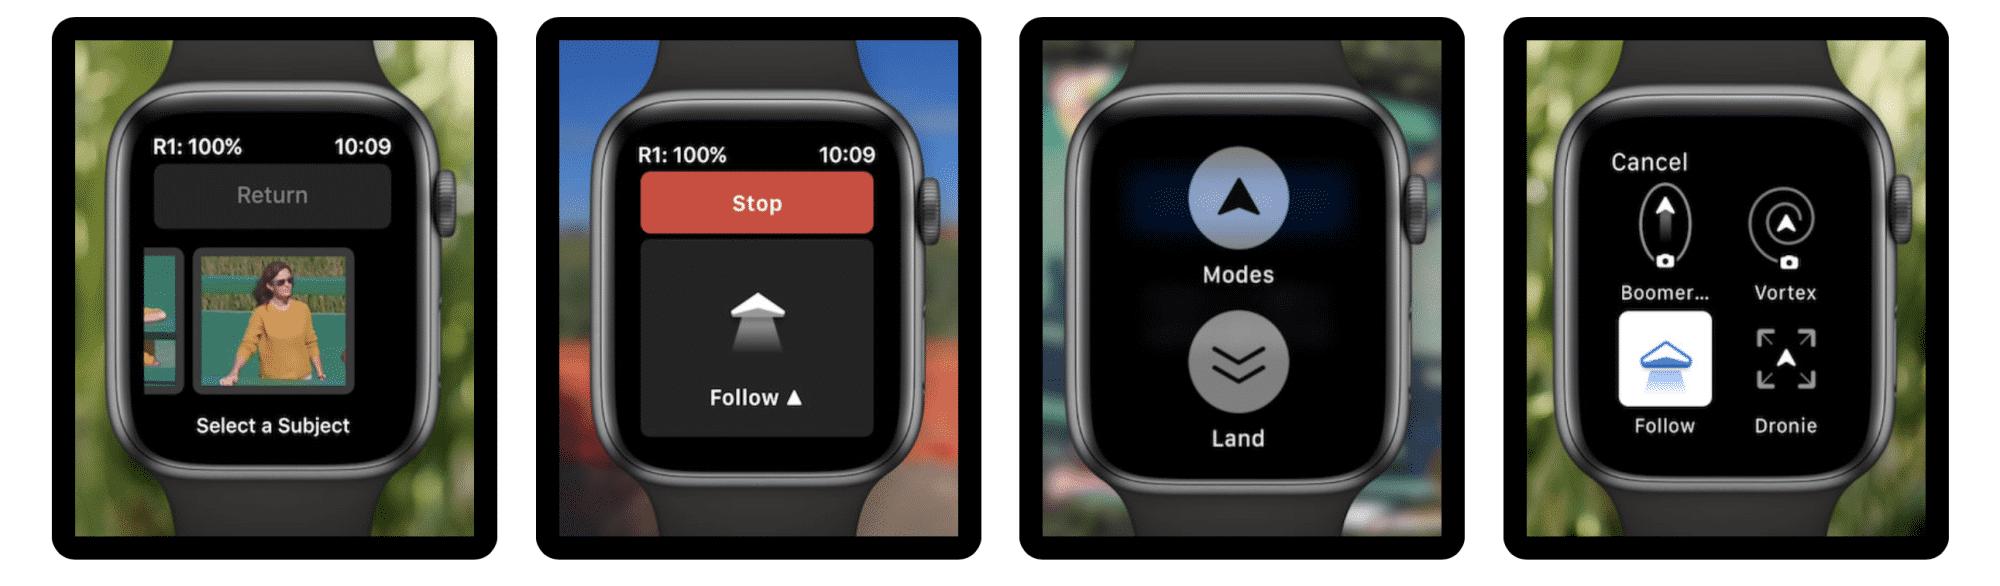 Apple Watch Skydio